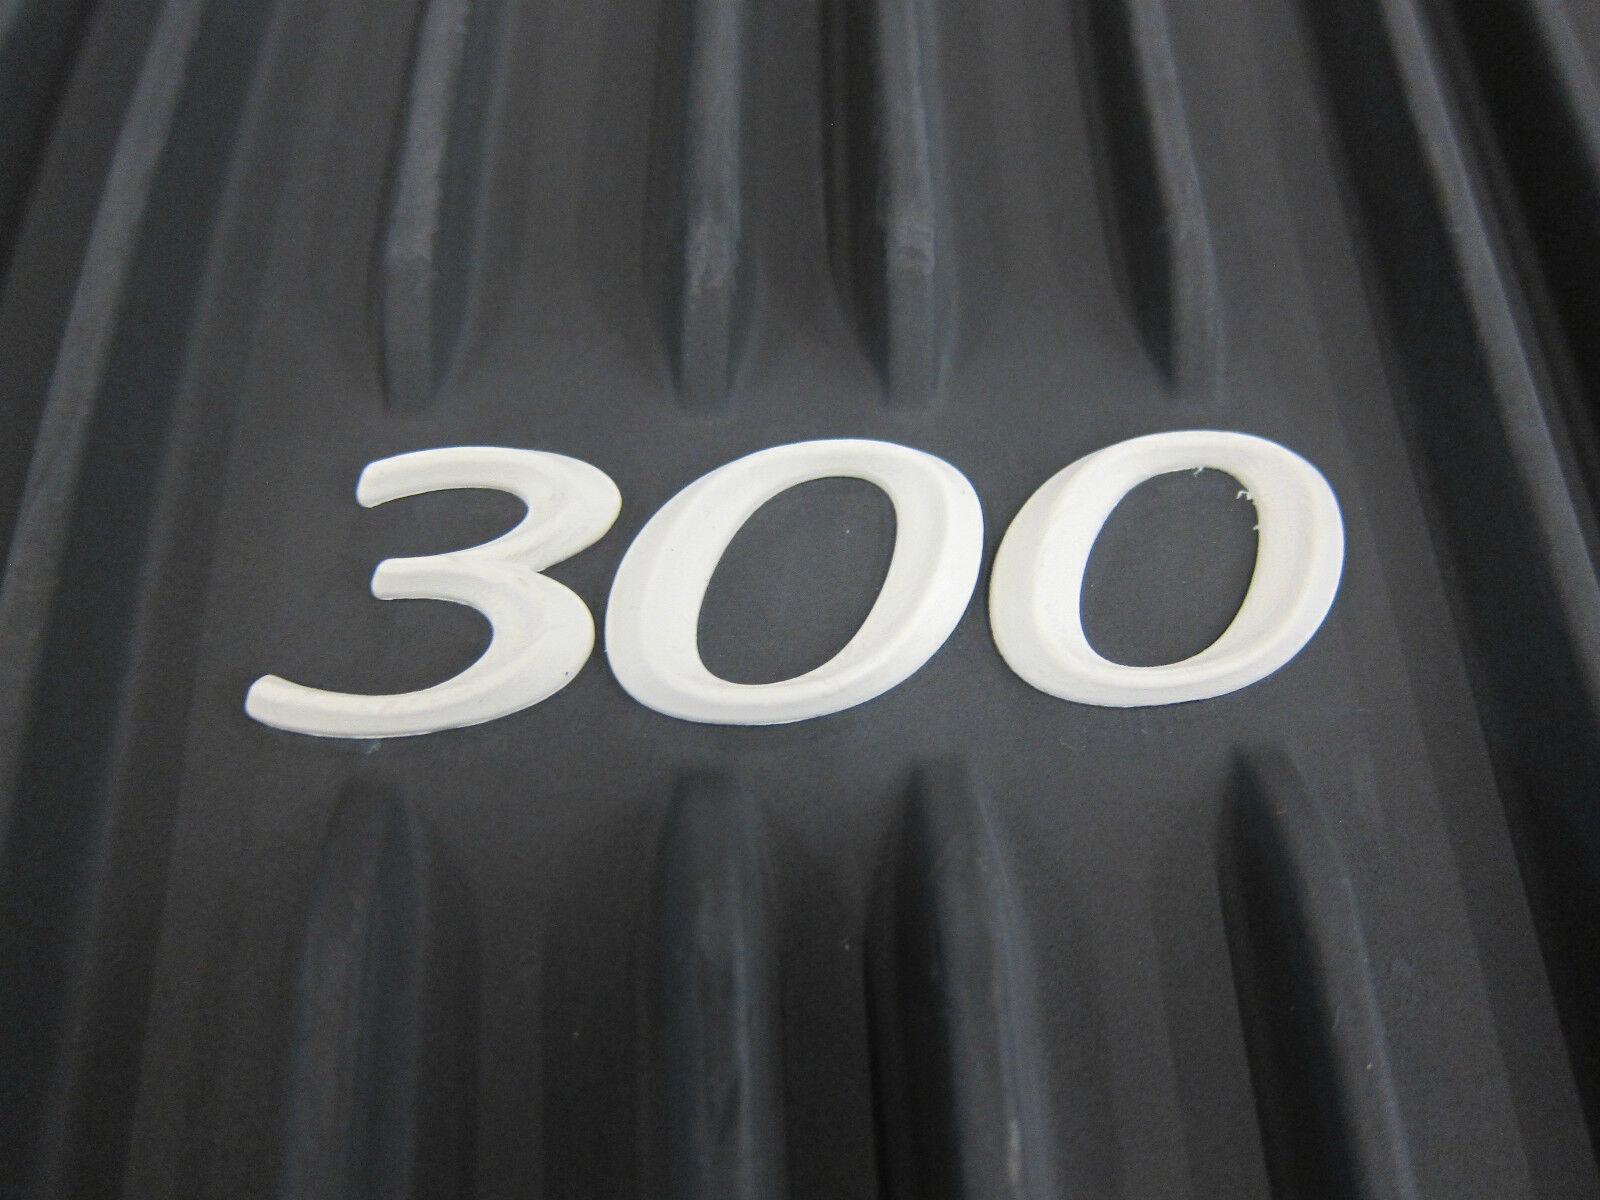 2011 2018 Chrysler 300 Awd All Weather Rubber Slush Mats